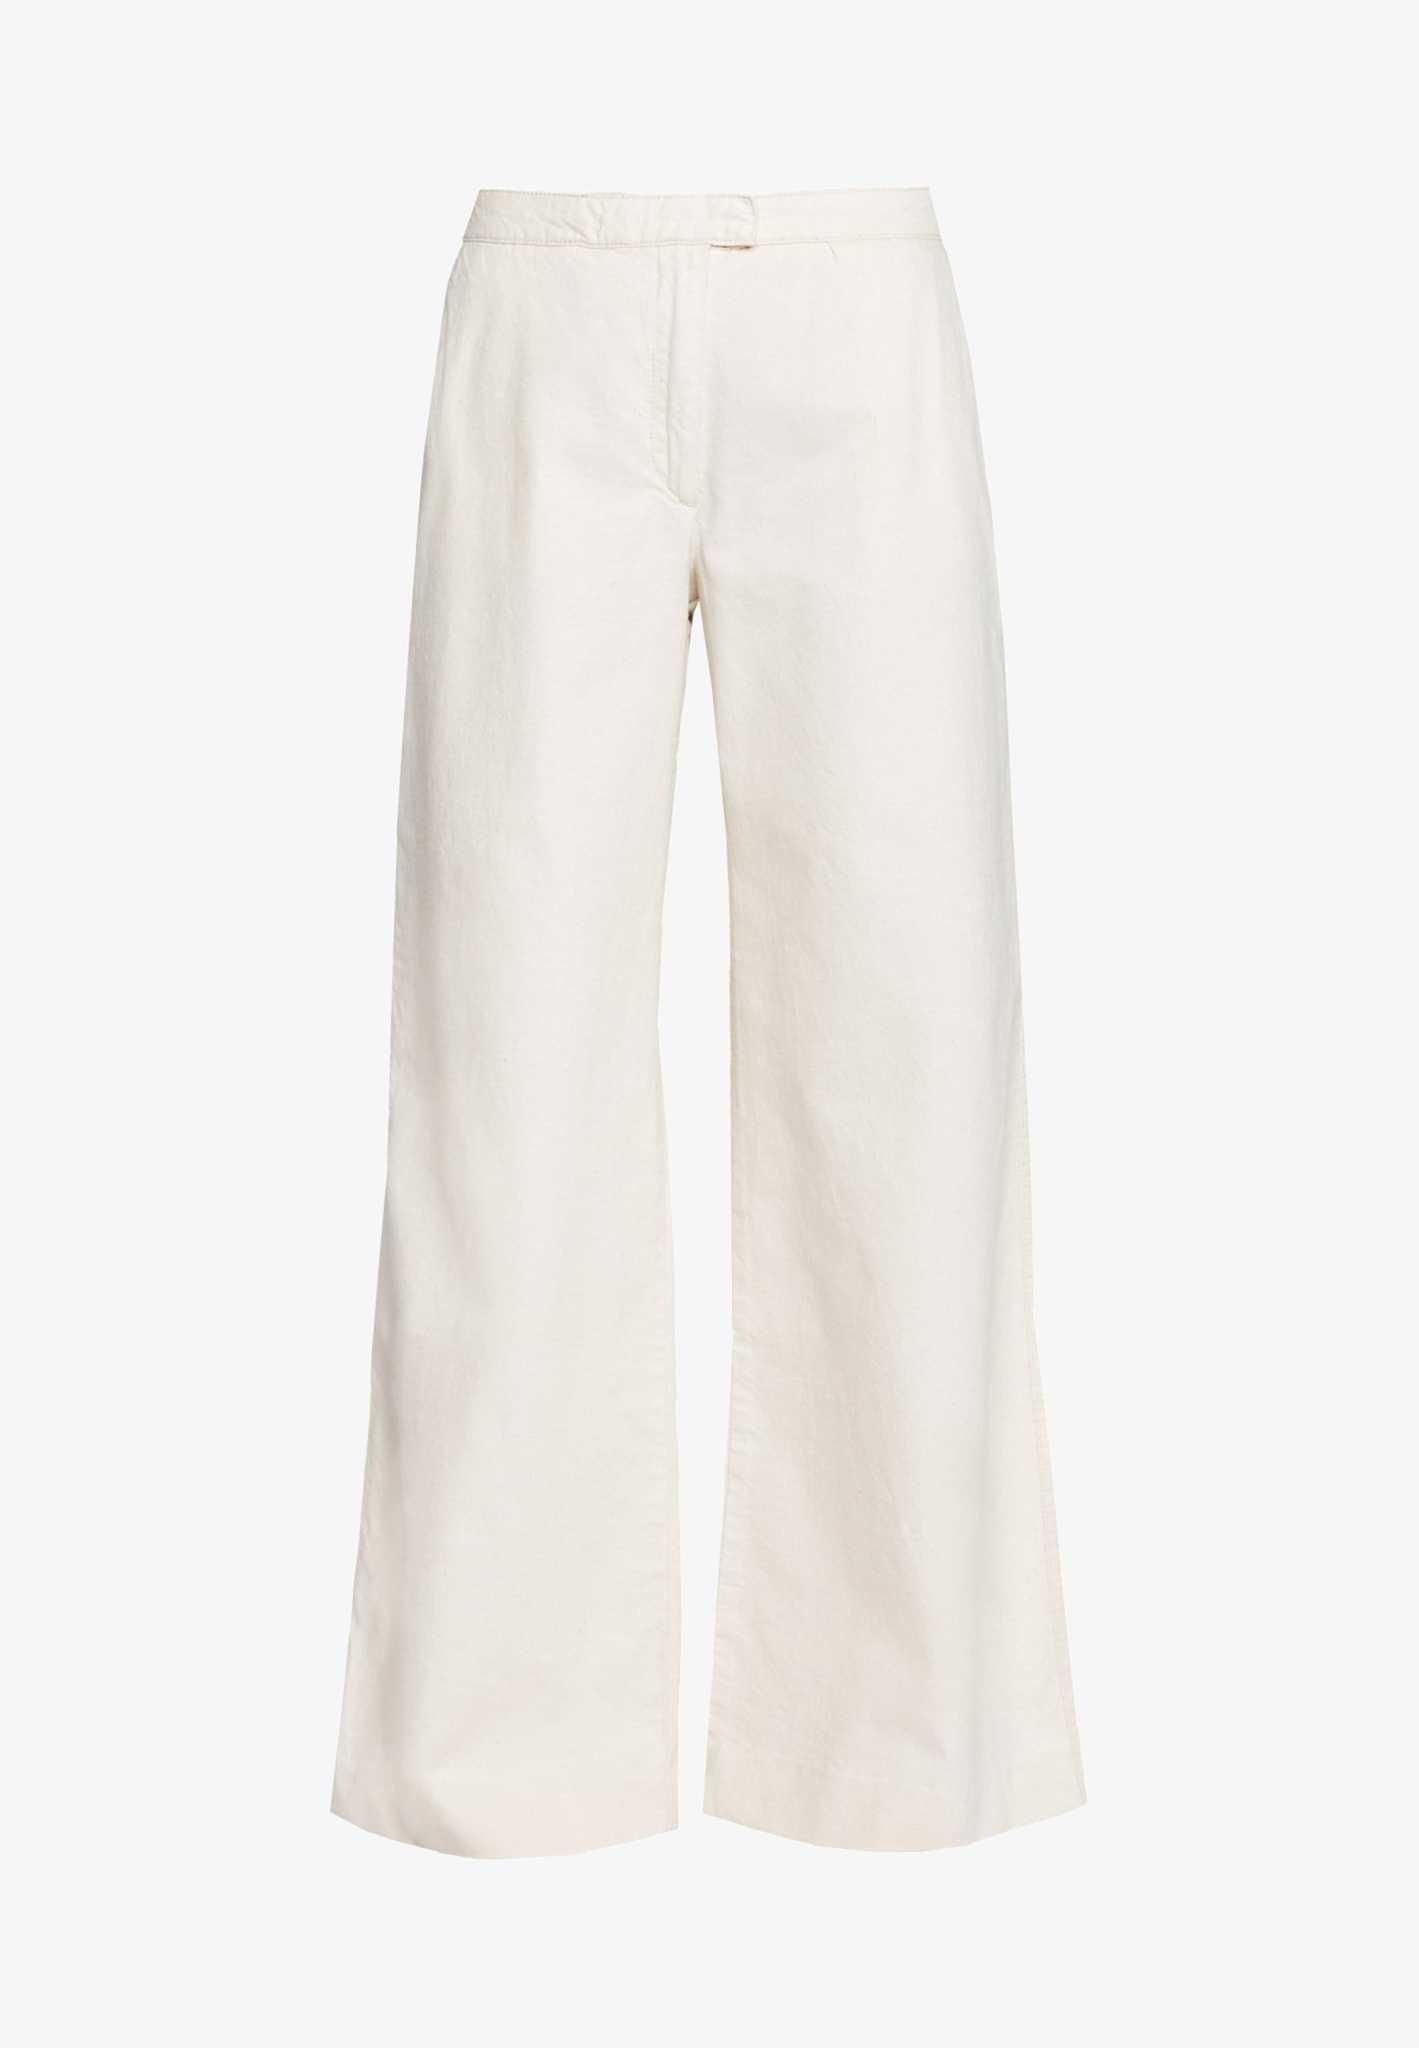 Collot trousers Samsoe Samsoe-1